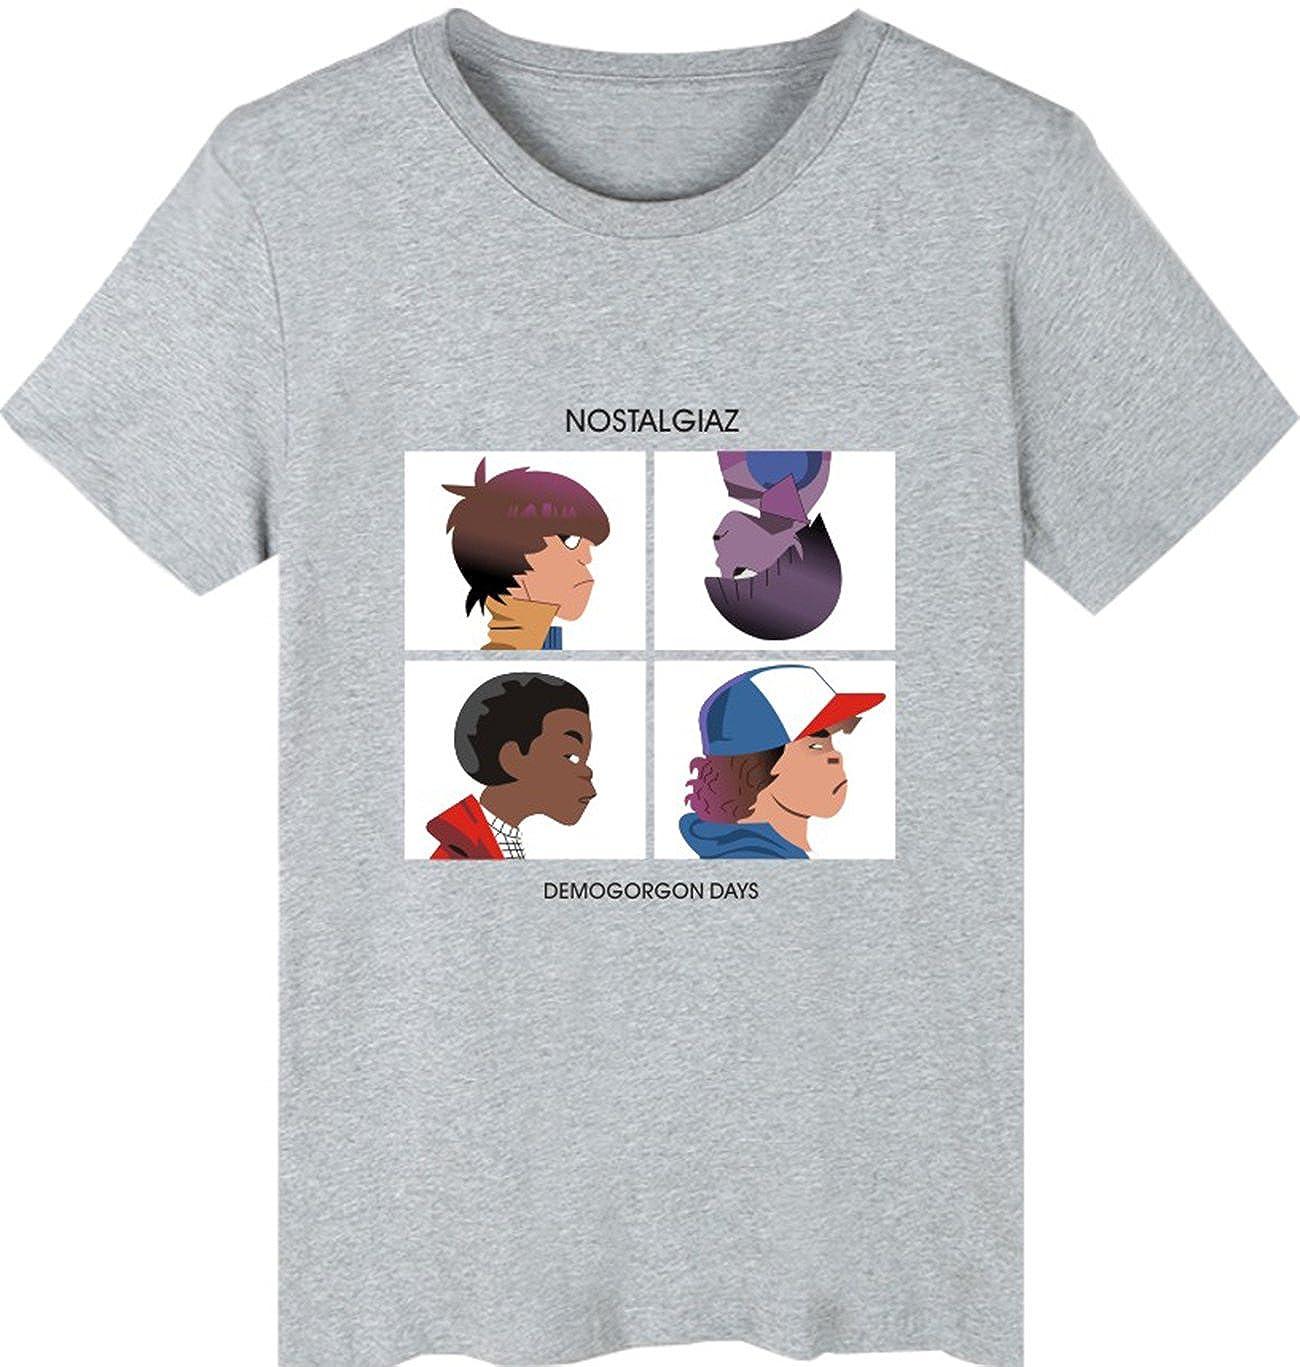 SERAPHY Unisex Stranger Things T-Shirt Estate Tshirt per Donne e Uomini Hip Hop t Shirt